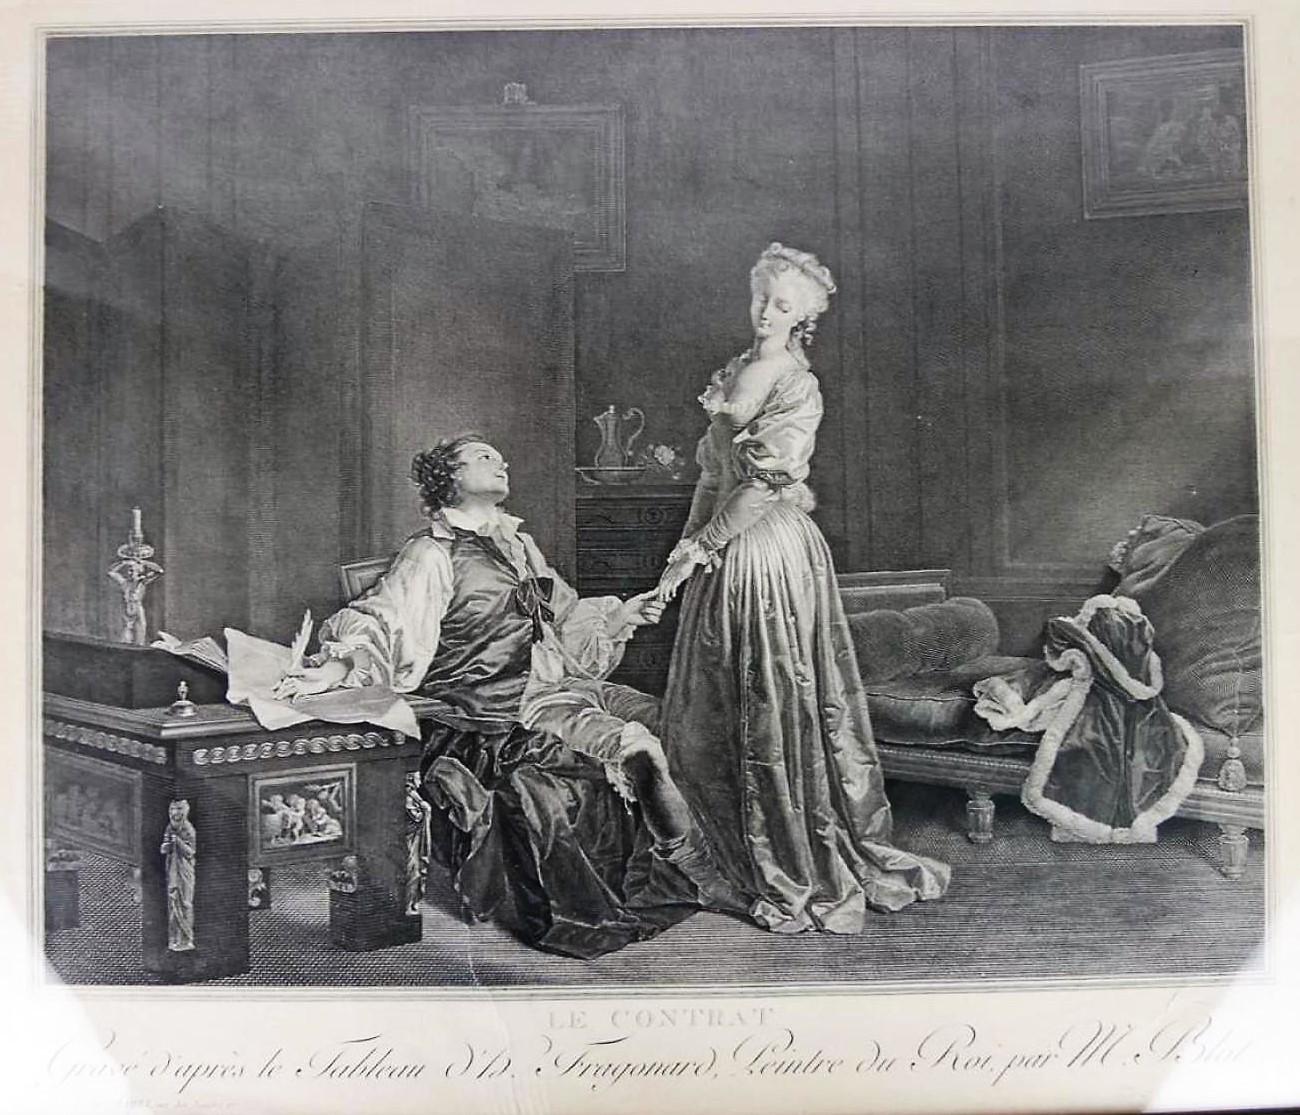 Fragonard 1778 Le contrat Gravure de Blot 1792